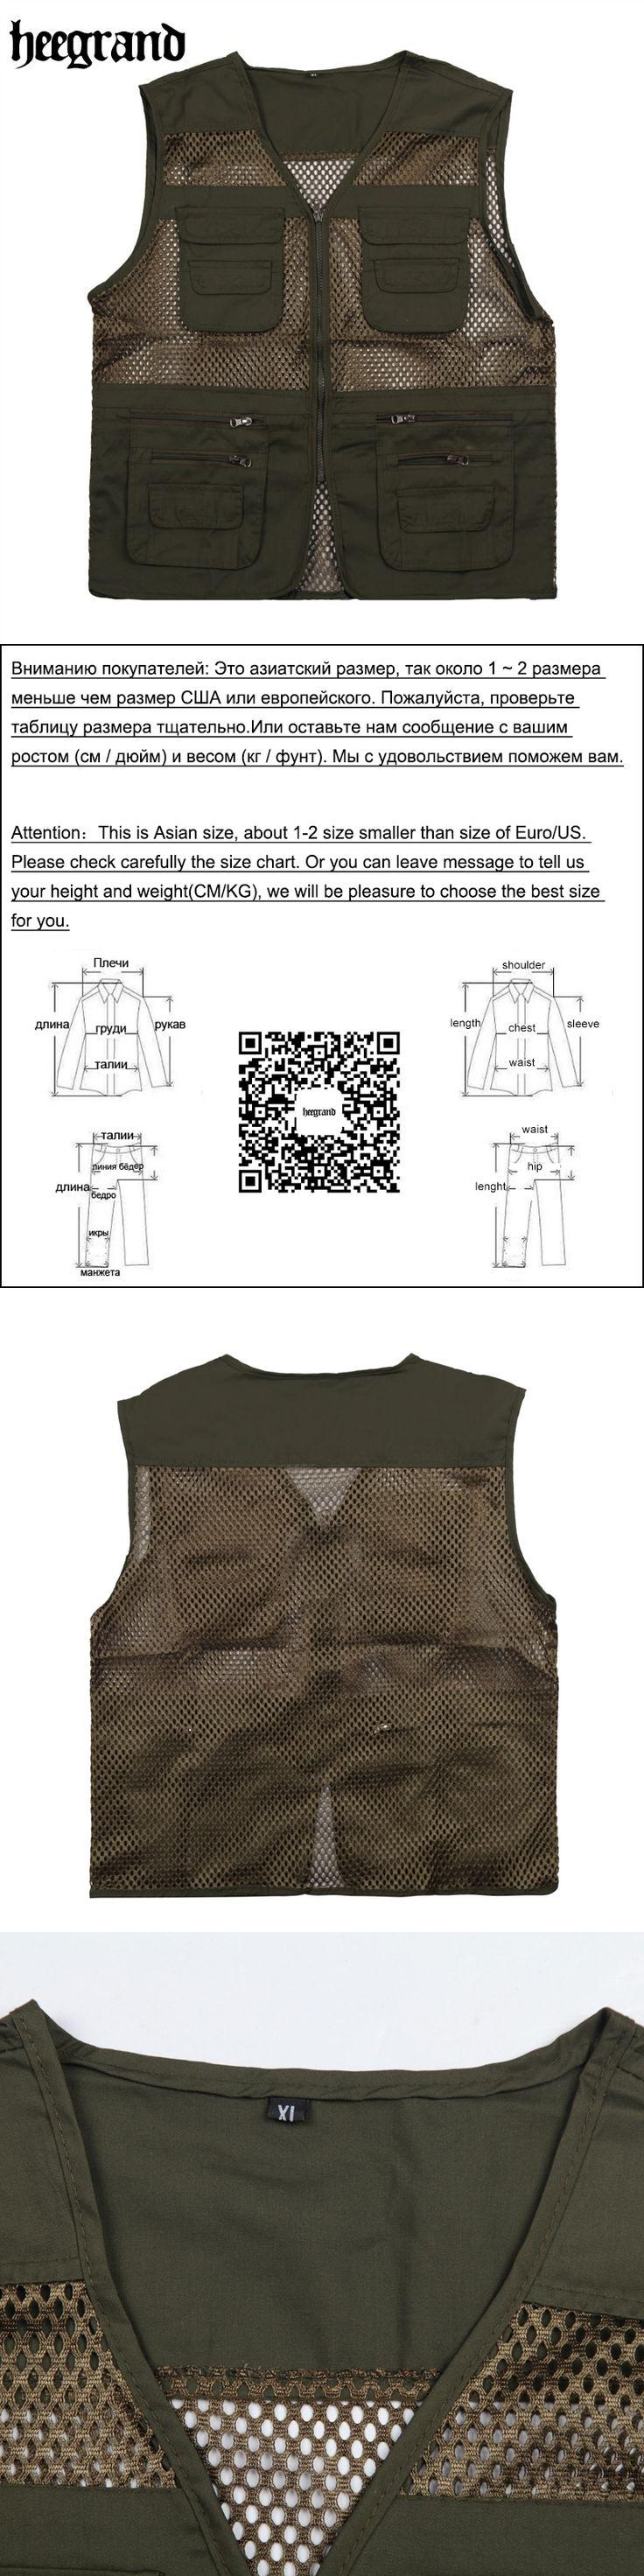 HEE GRAND 2017 Men Summer Vest Fashion V-Neck Breathable Solid Plus Size Men Army Green Vest MWB198